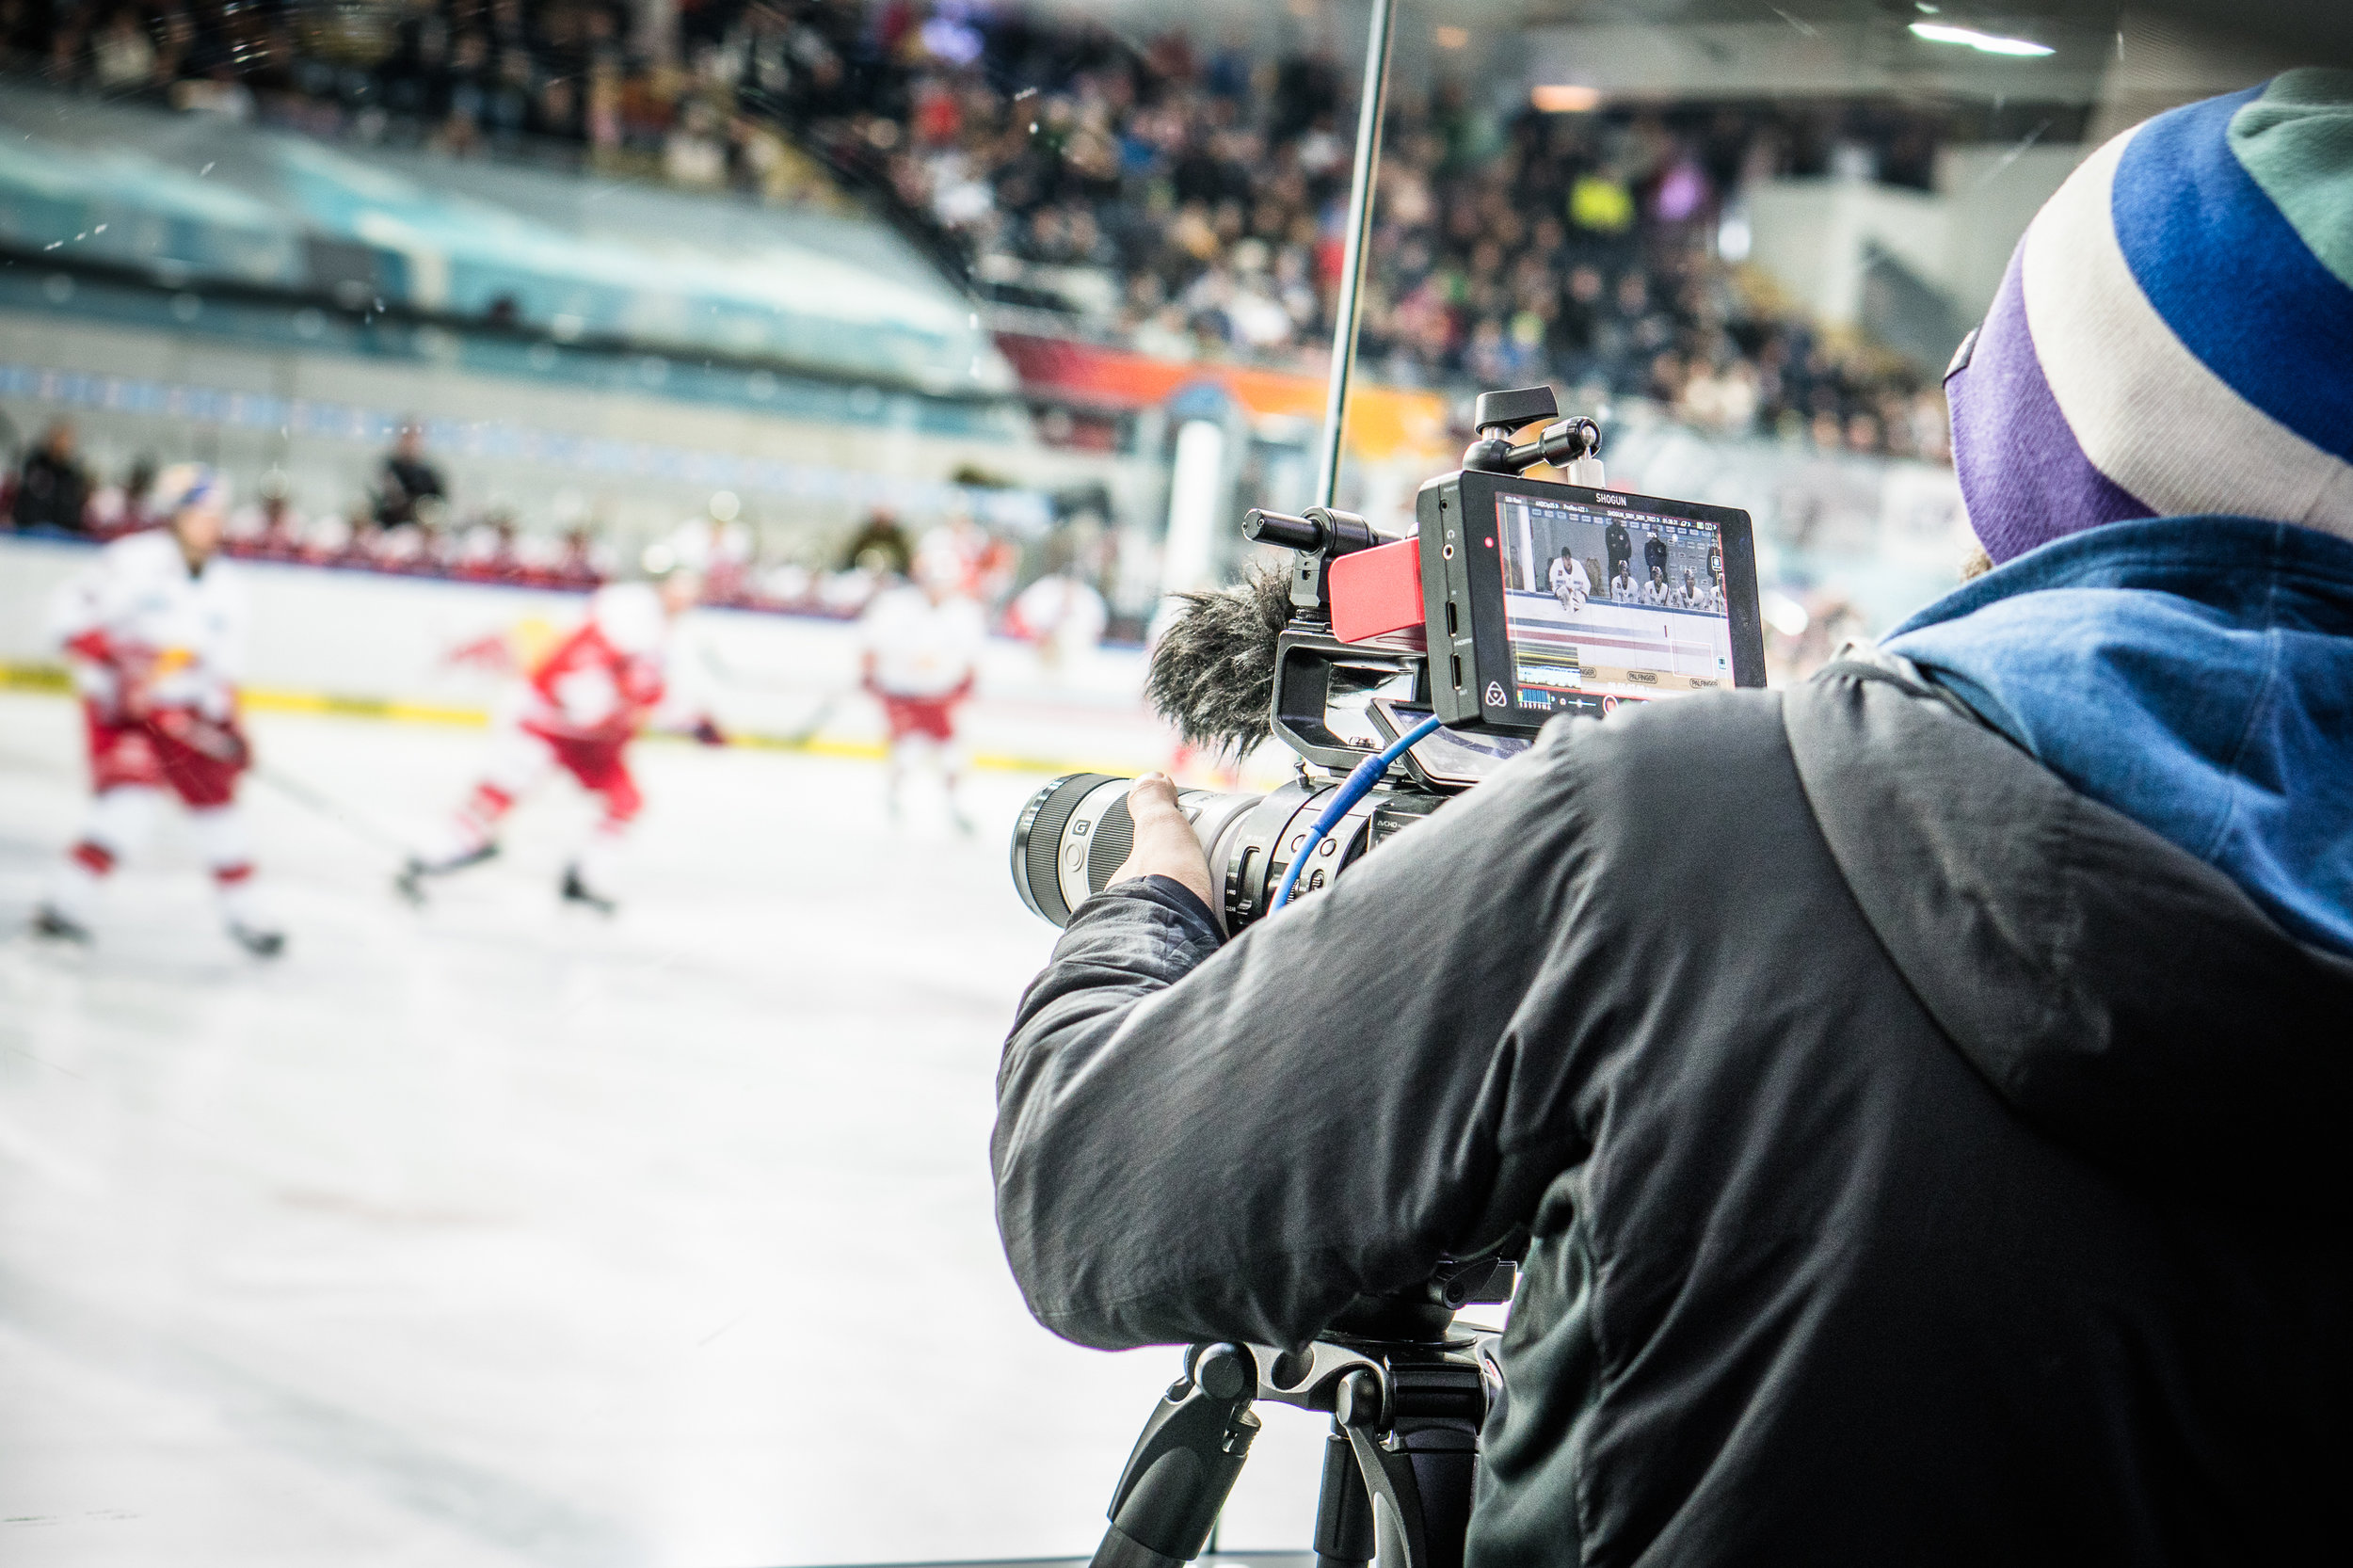 EpicMinutes-Behind-RedBull-Eishockey-WEB-by-BAUSE-036.jpg